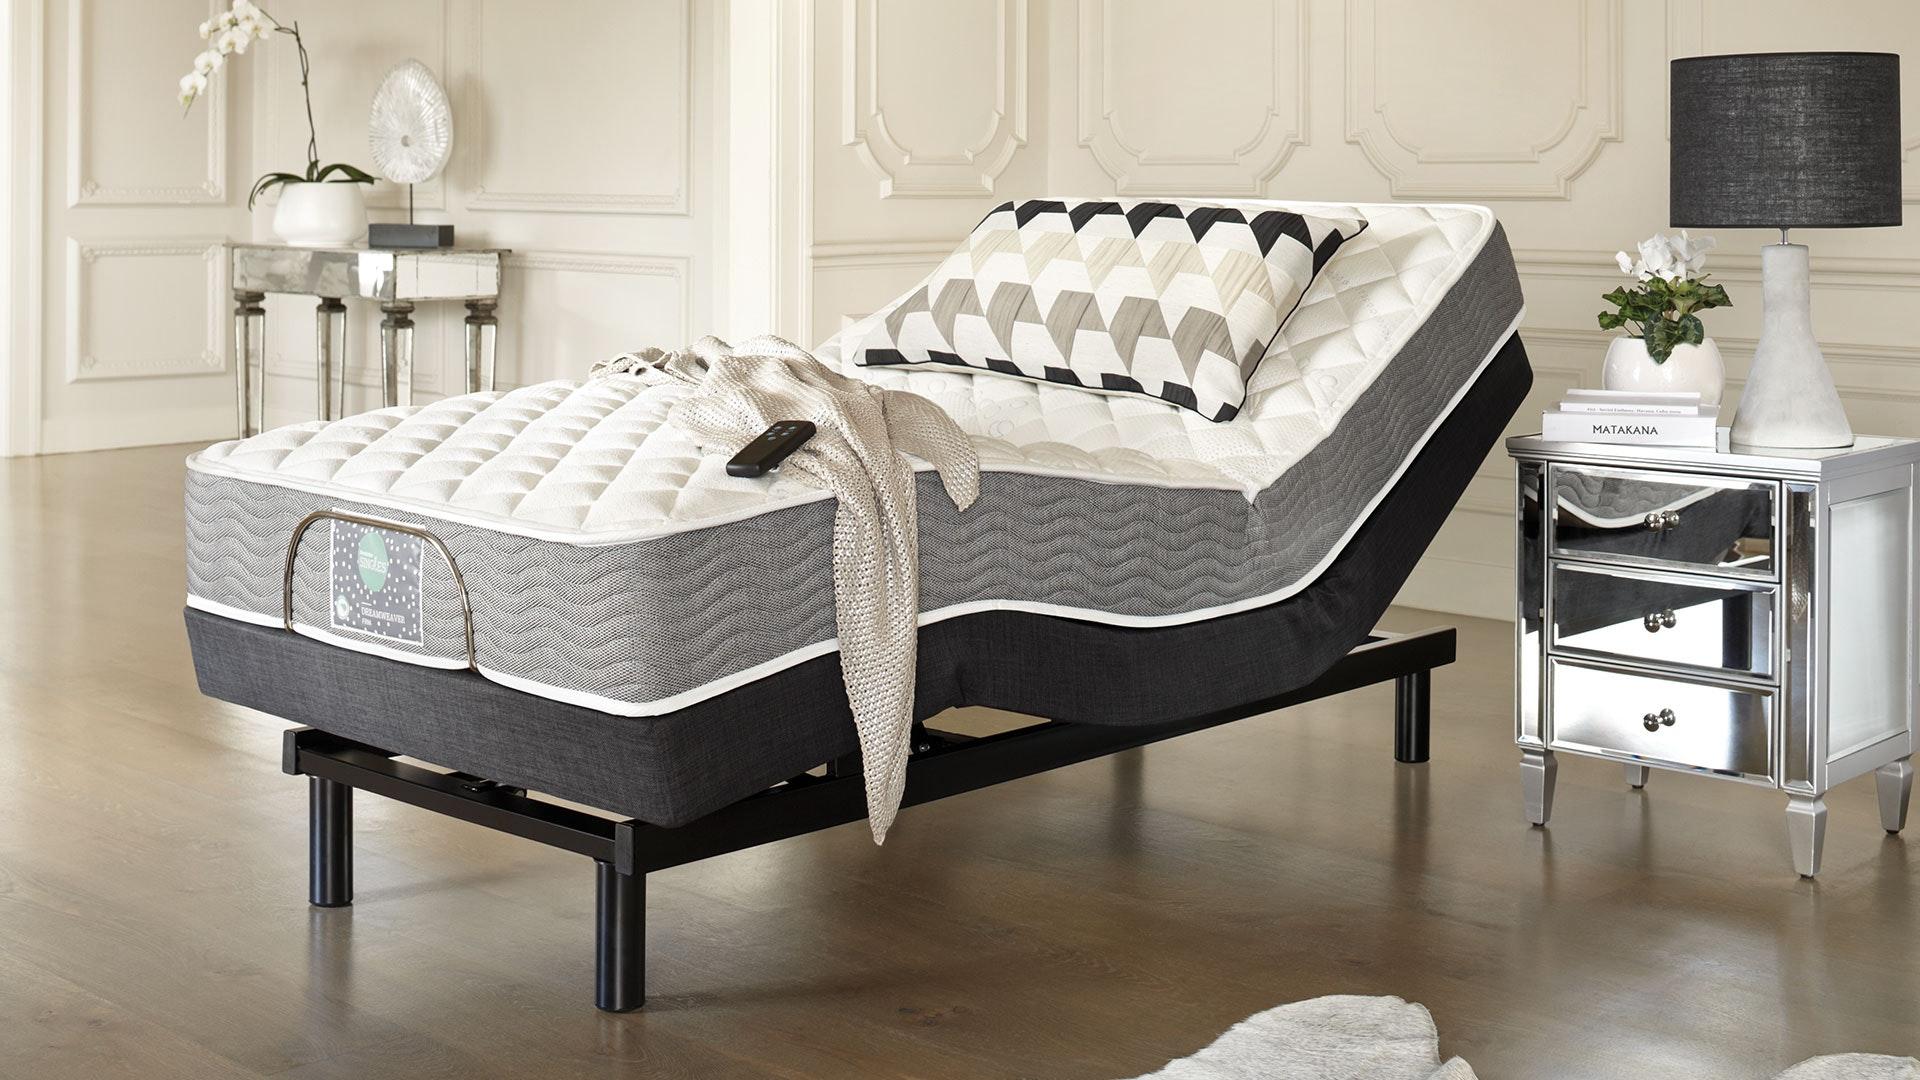 Sleepmaker Dreamweaver Firm King Single Mattress with Lifestyle Adjustable Base by Tempur